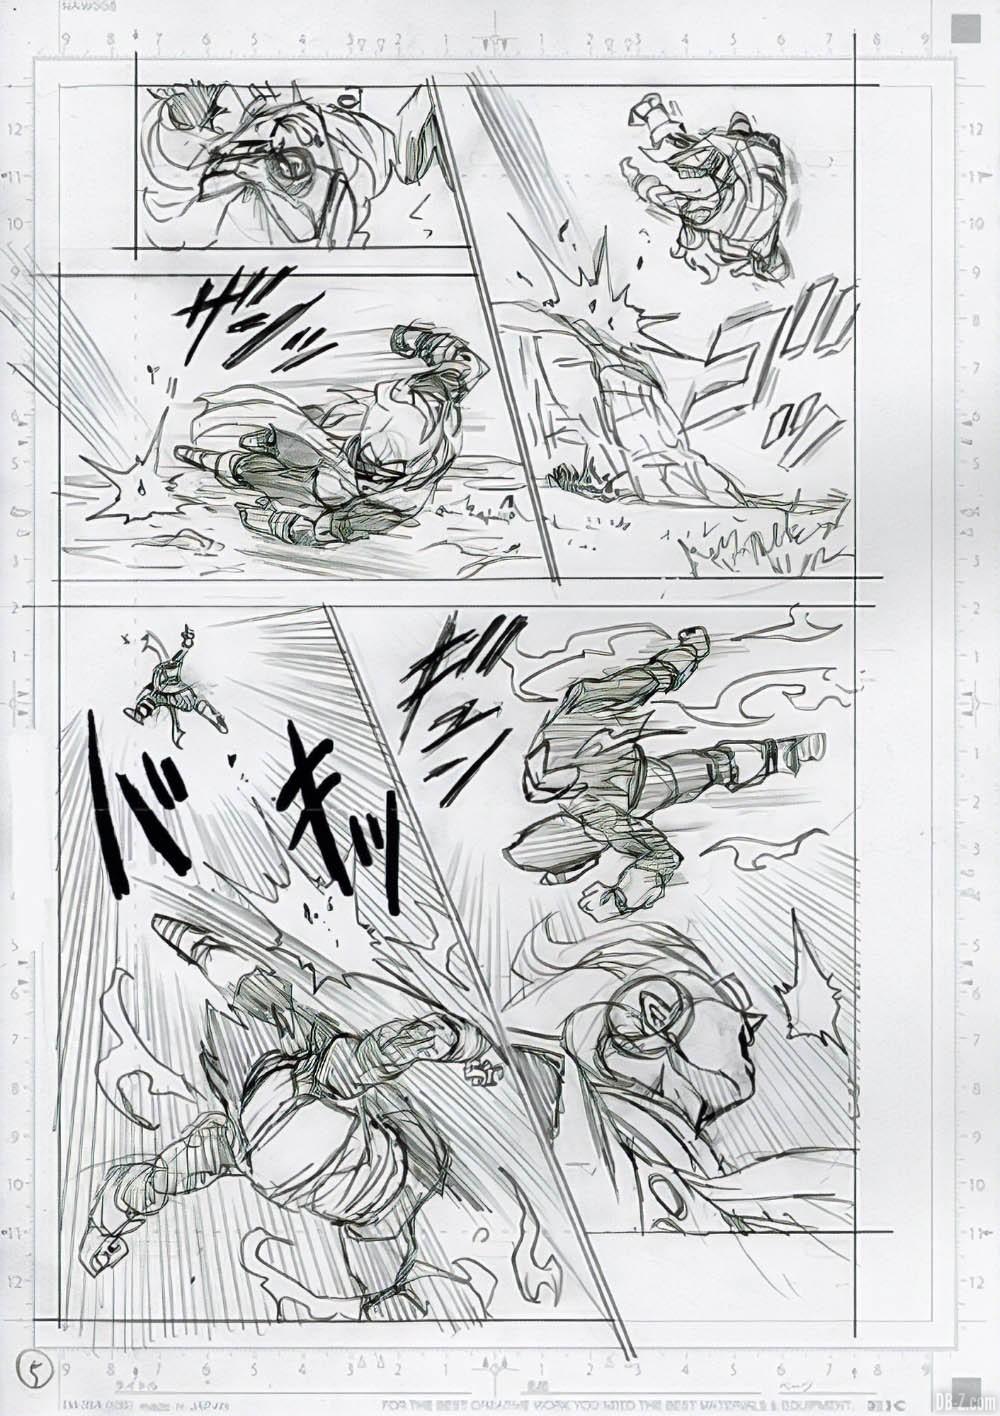 Dragon-Ball-Super-Chapitre-75-Brouillon-5-4x Manga109Attempt